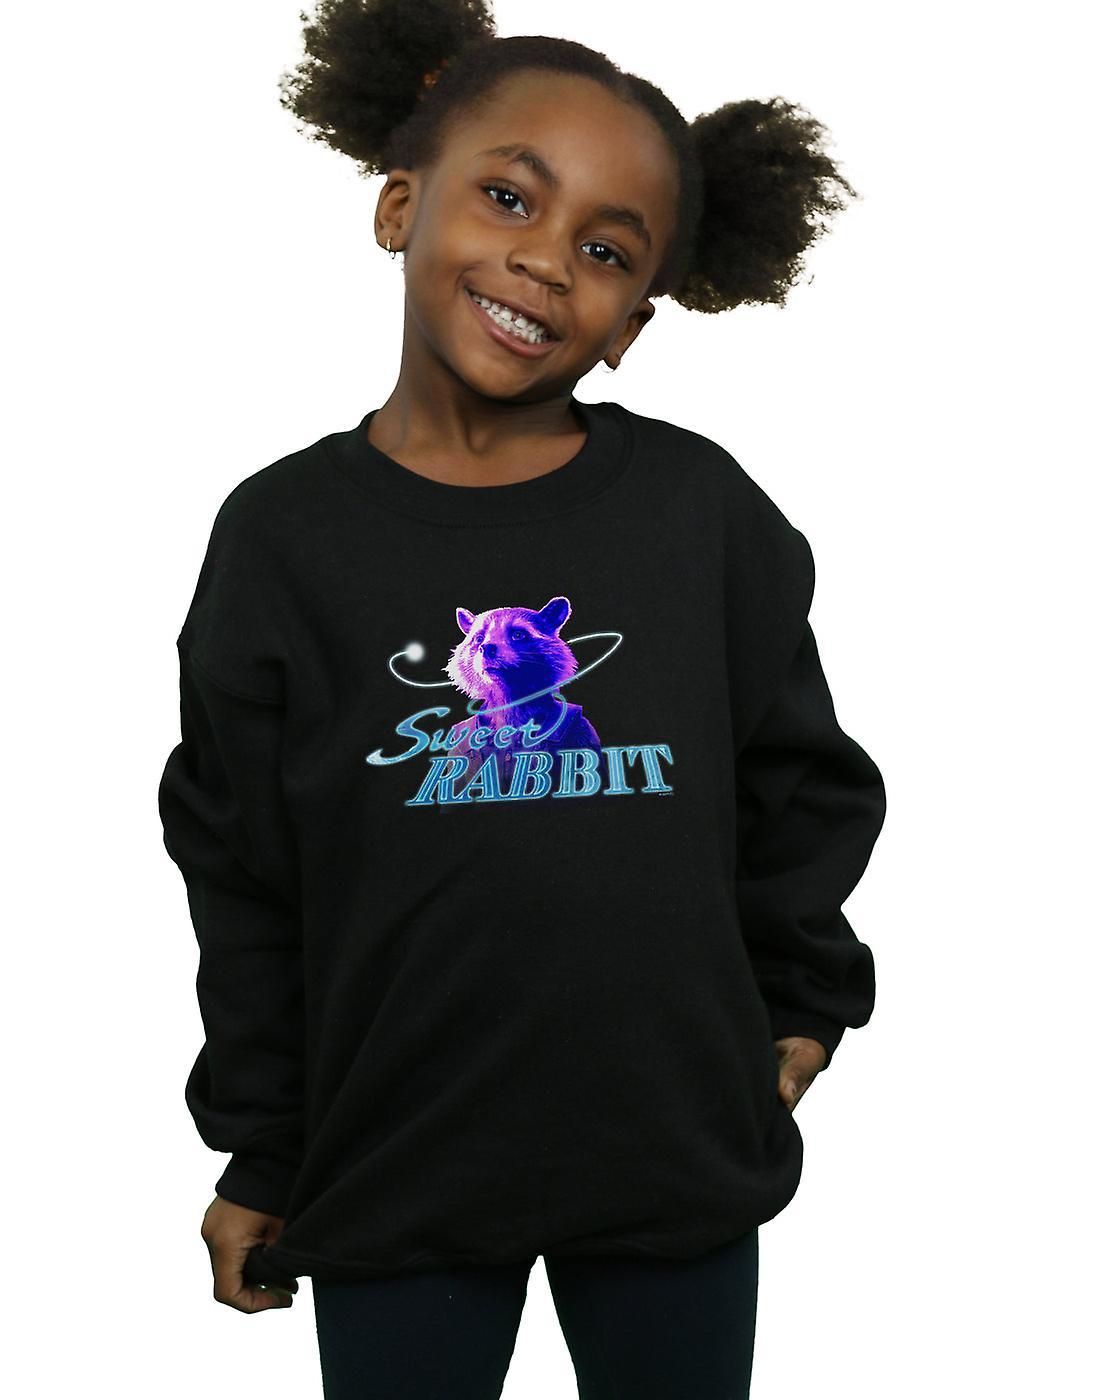 Marvel Girls Avengers Infinity War Sweet Rabbit Sweatshirt